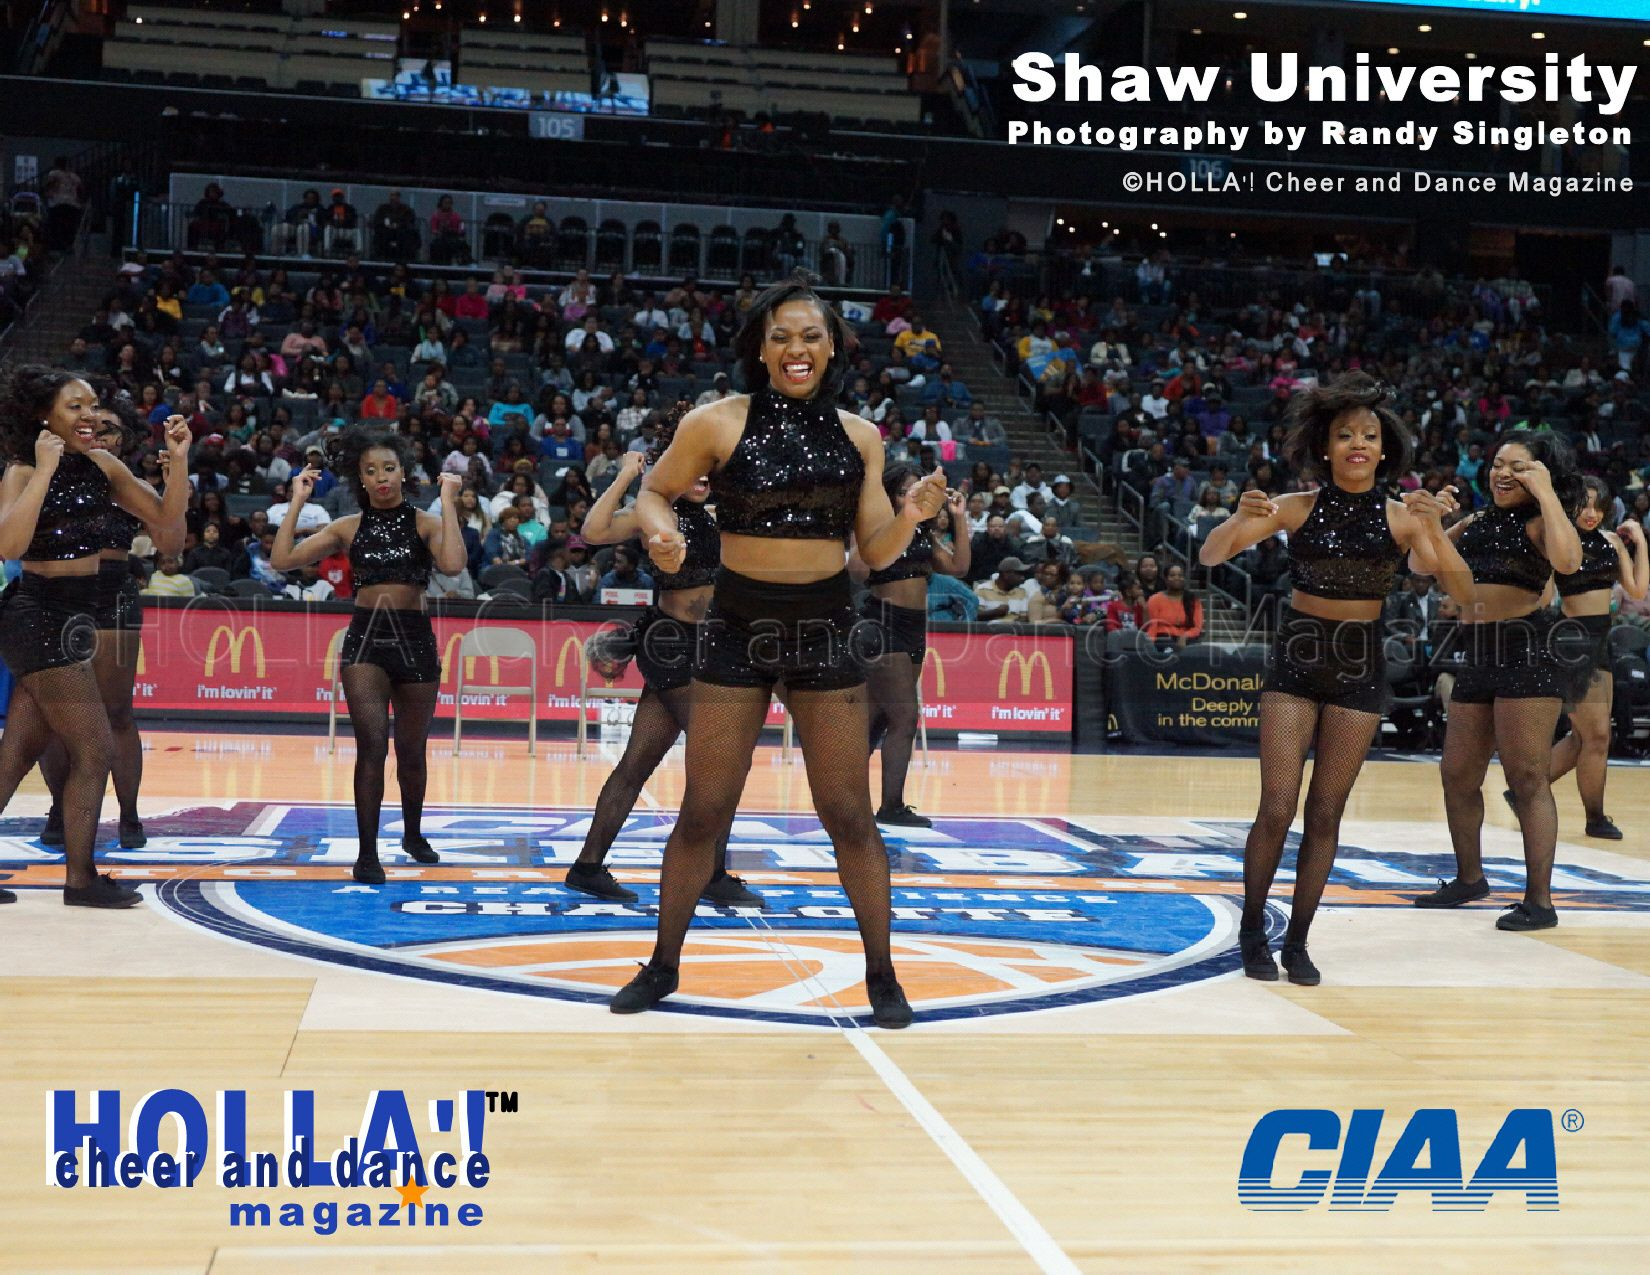 Shaw university see more ciaa cheerleading exhibition